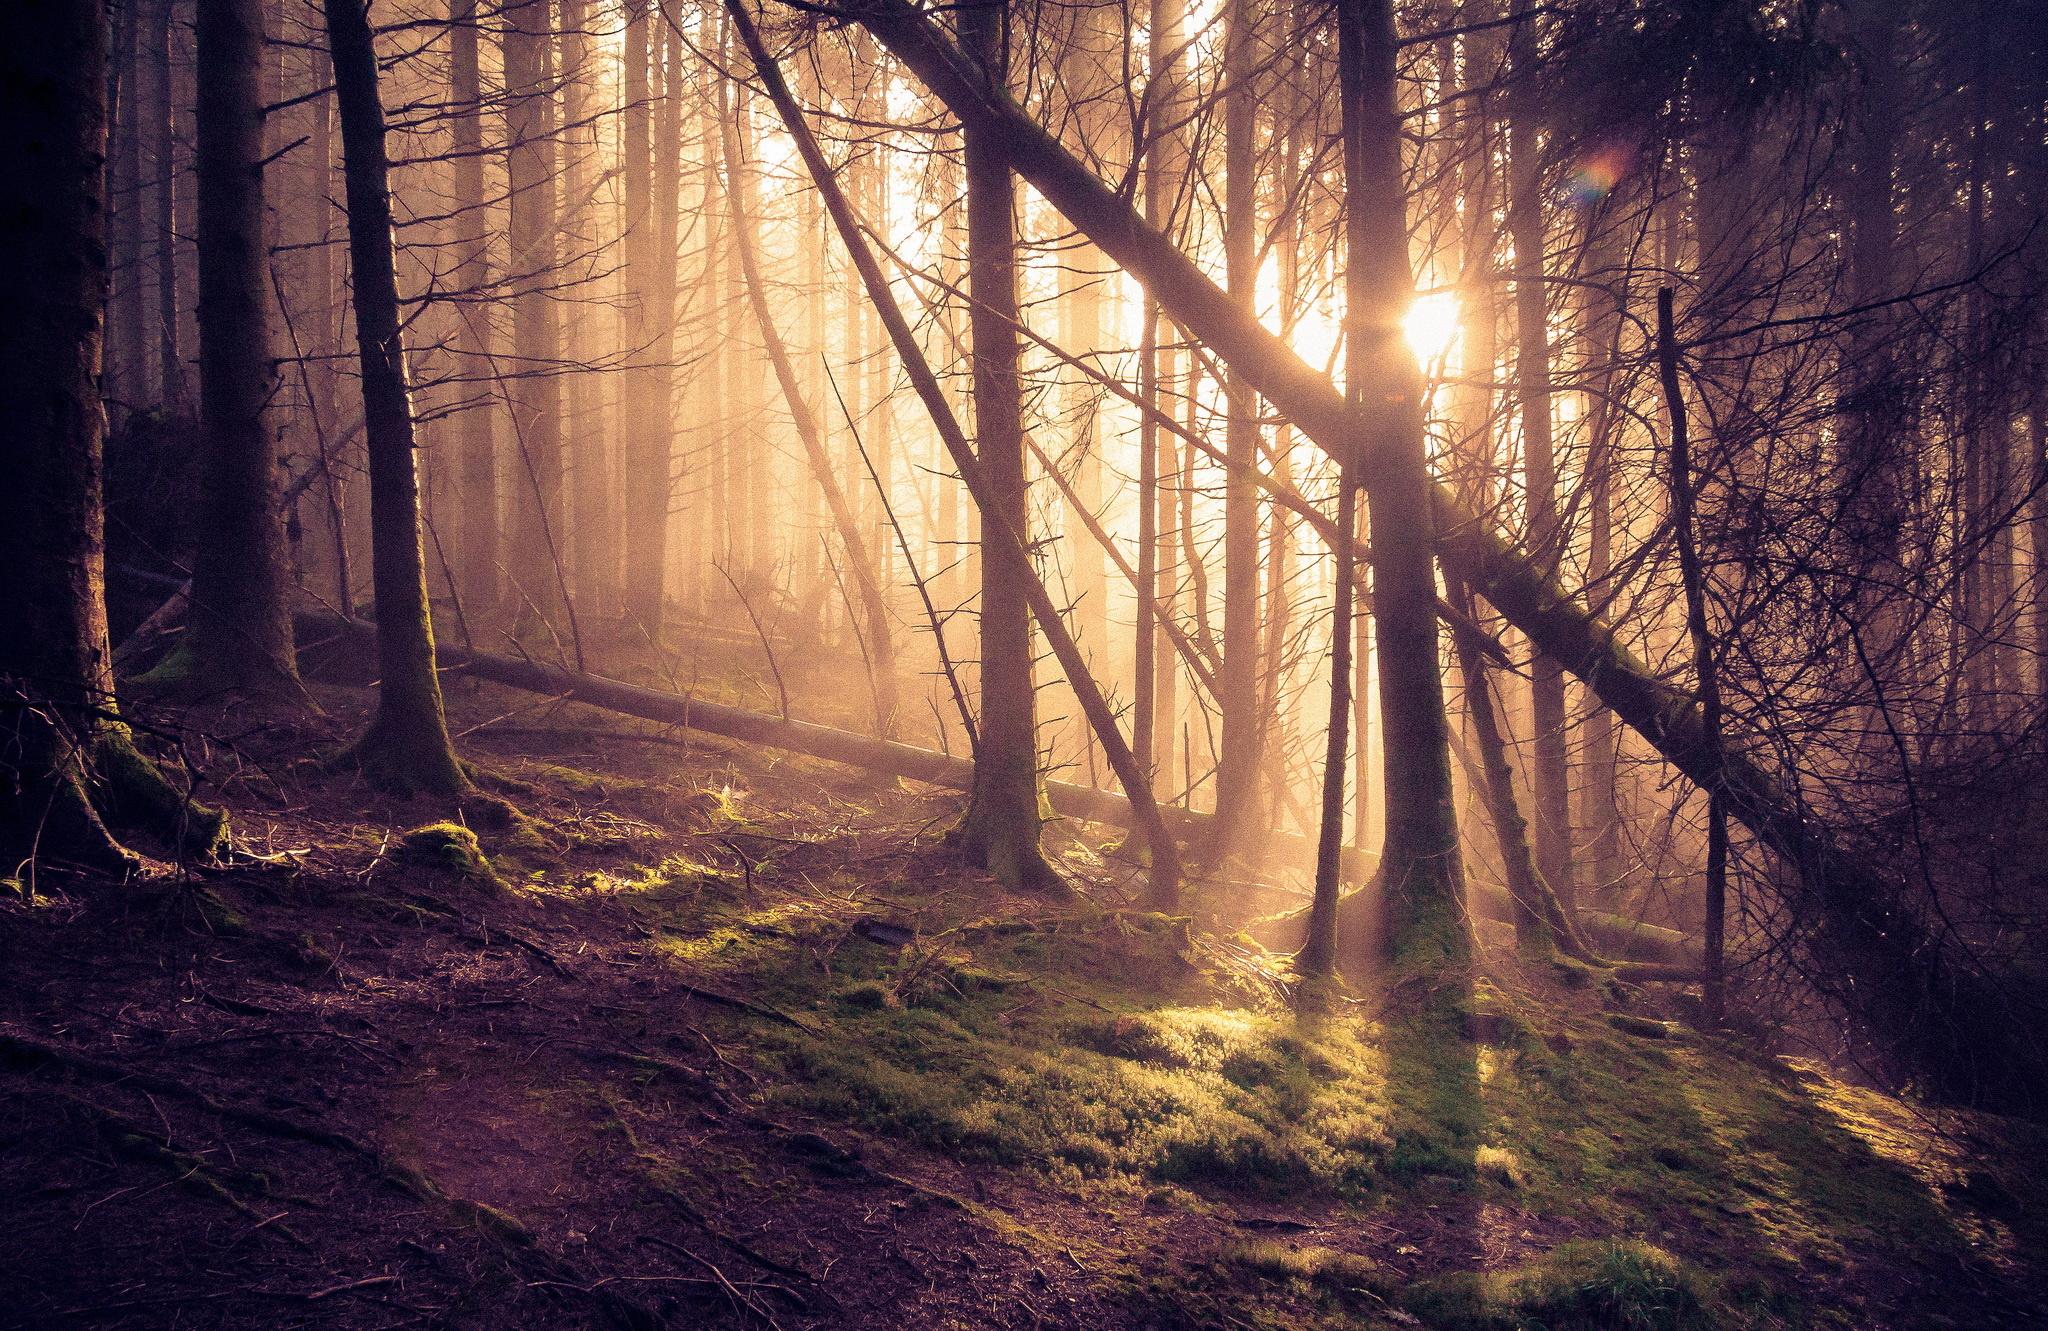 Wallpaper forest pine tree tree sun rays desktop wallpaper 2048x1331